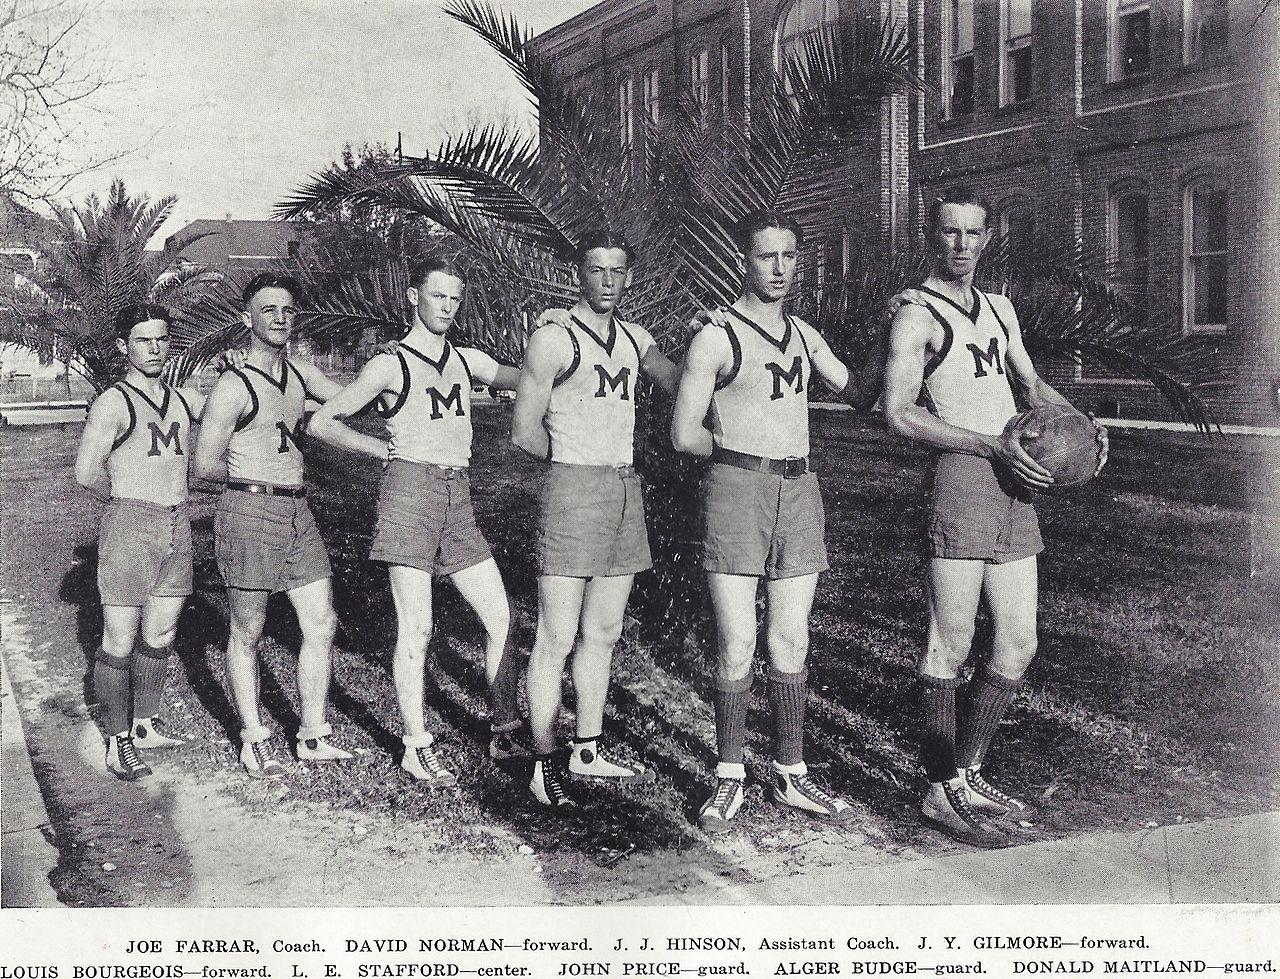 J Crew Stock Chart: 1923 Morgan City High School Boys Basketball Team.jpg ,Chart